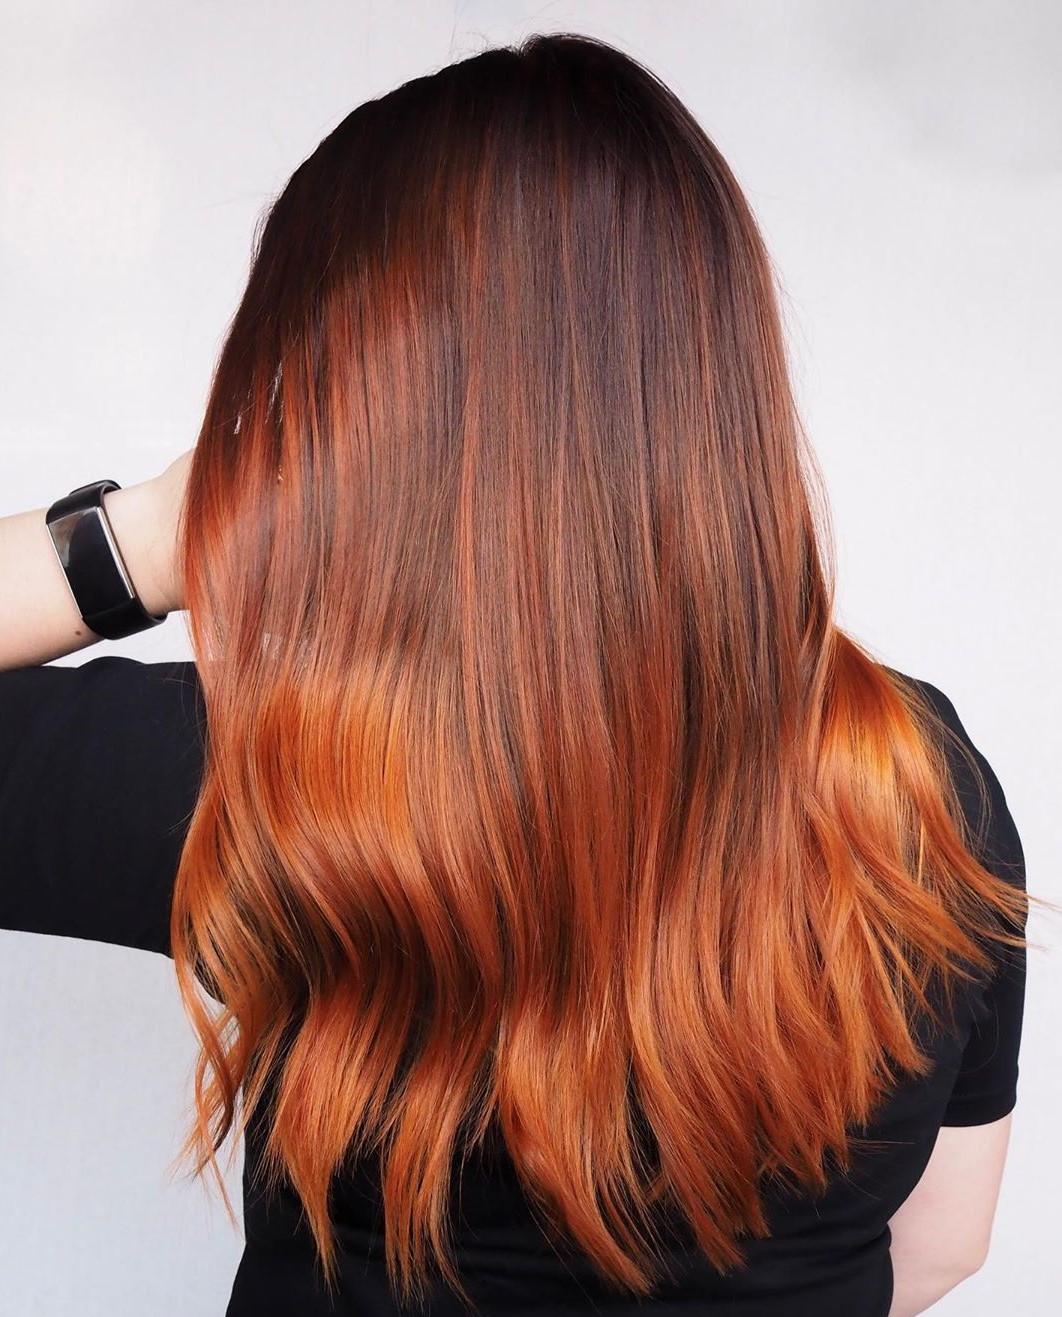 Copper Ombre for Auburn Hair